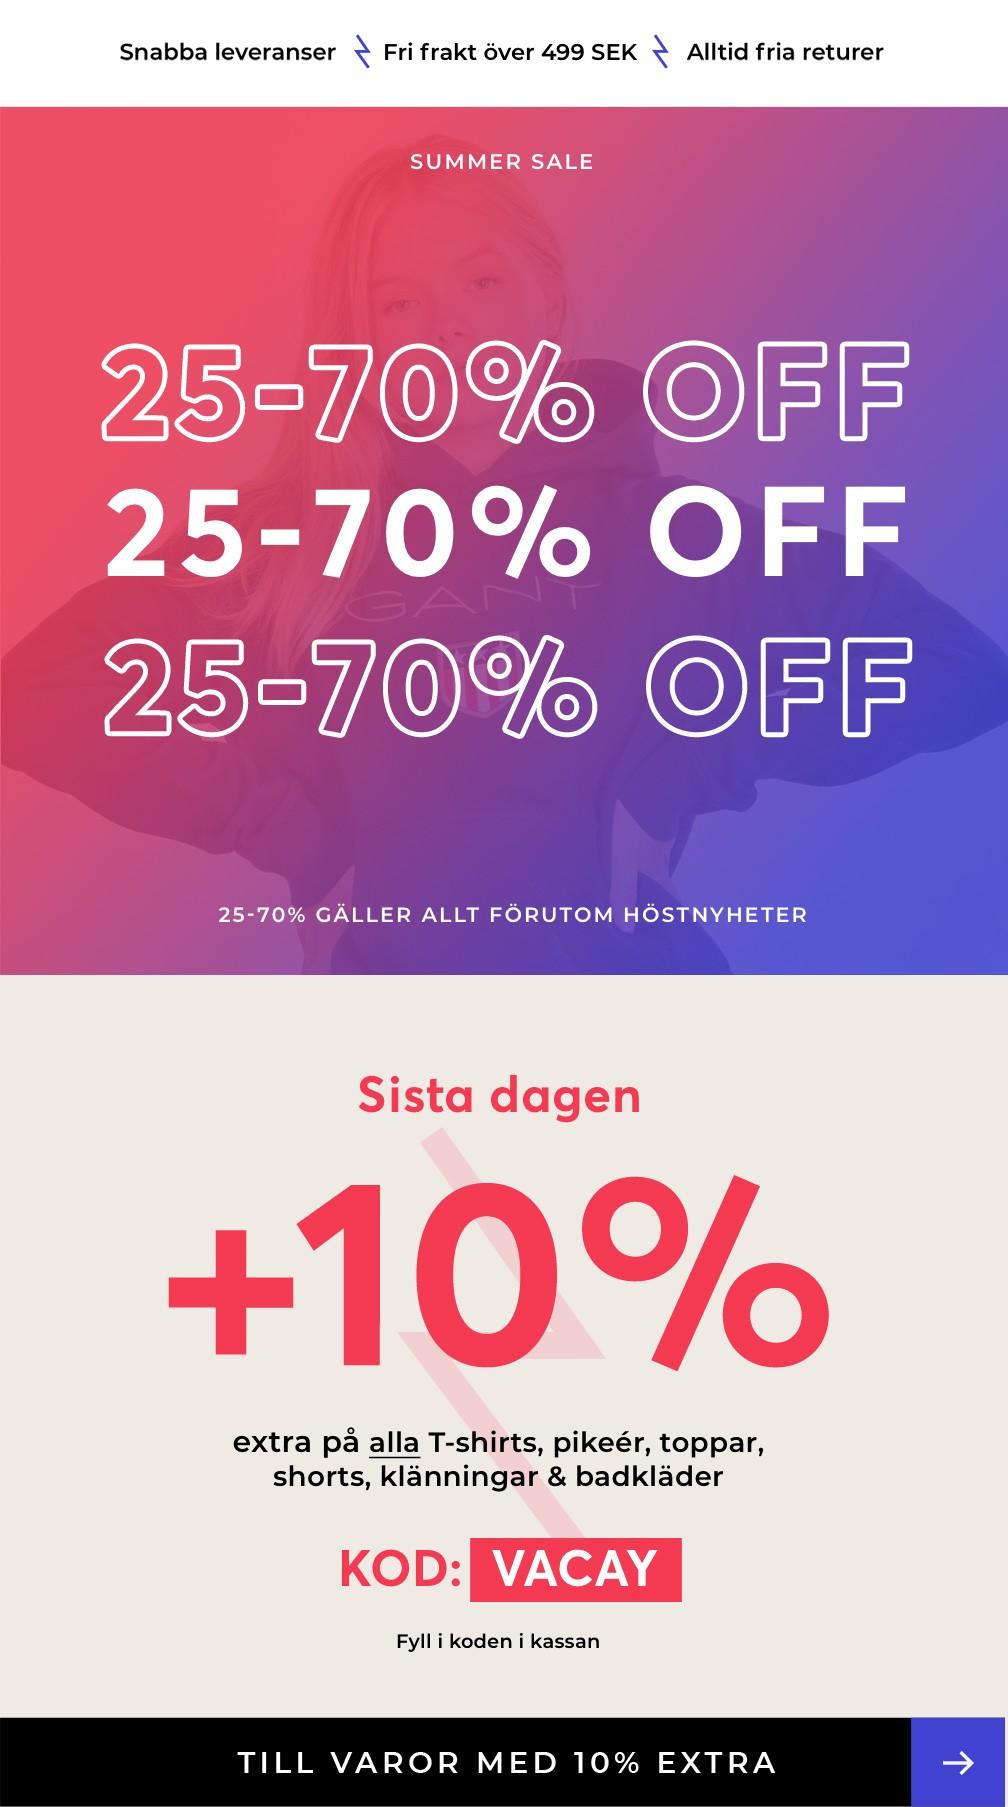 10% EXTRA 2